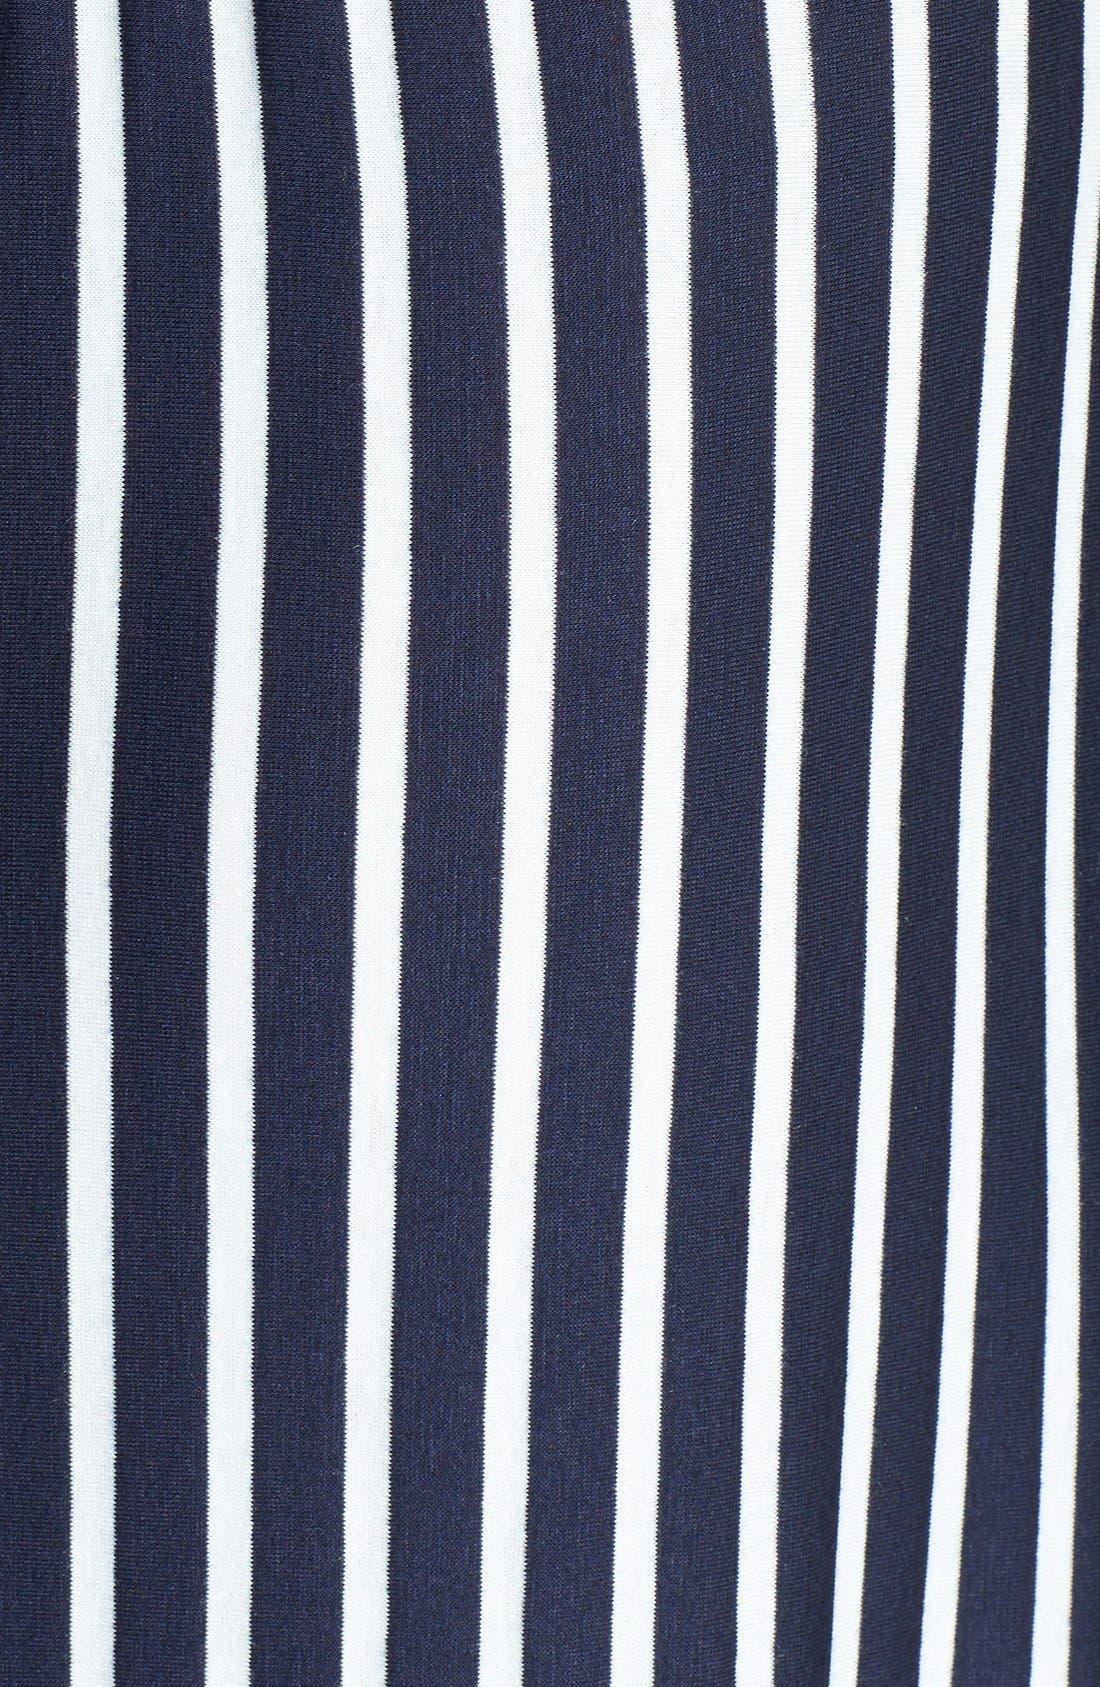 Alternate Image 3  - Loveappella Strapless Twist Back Stripe Maxi Dress (Regular & Petite)